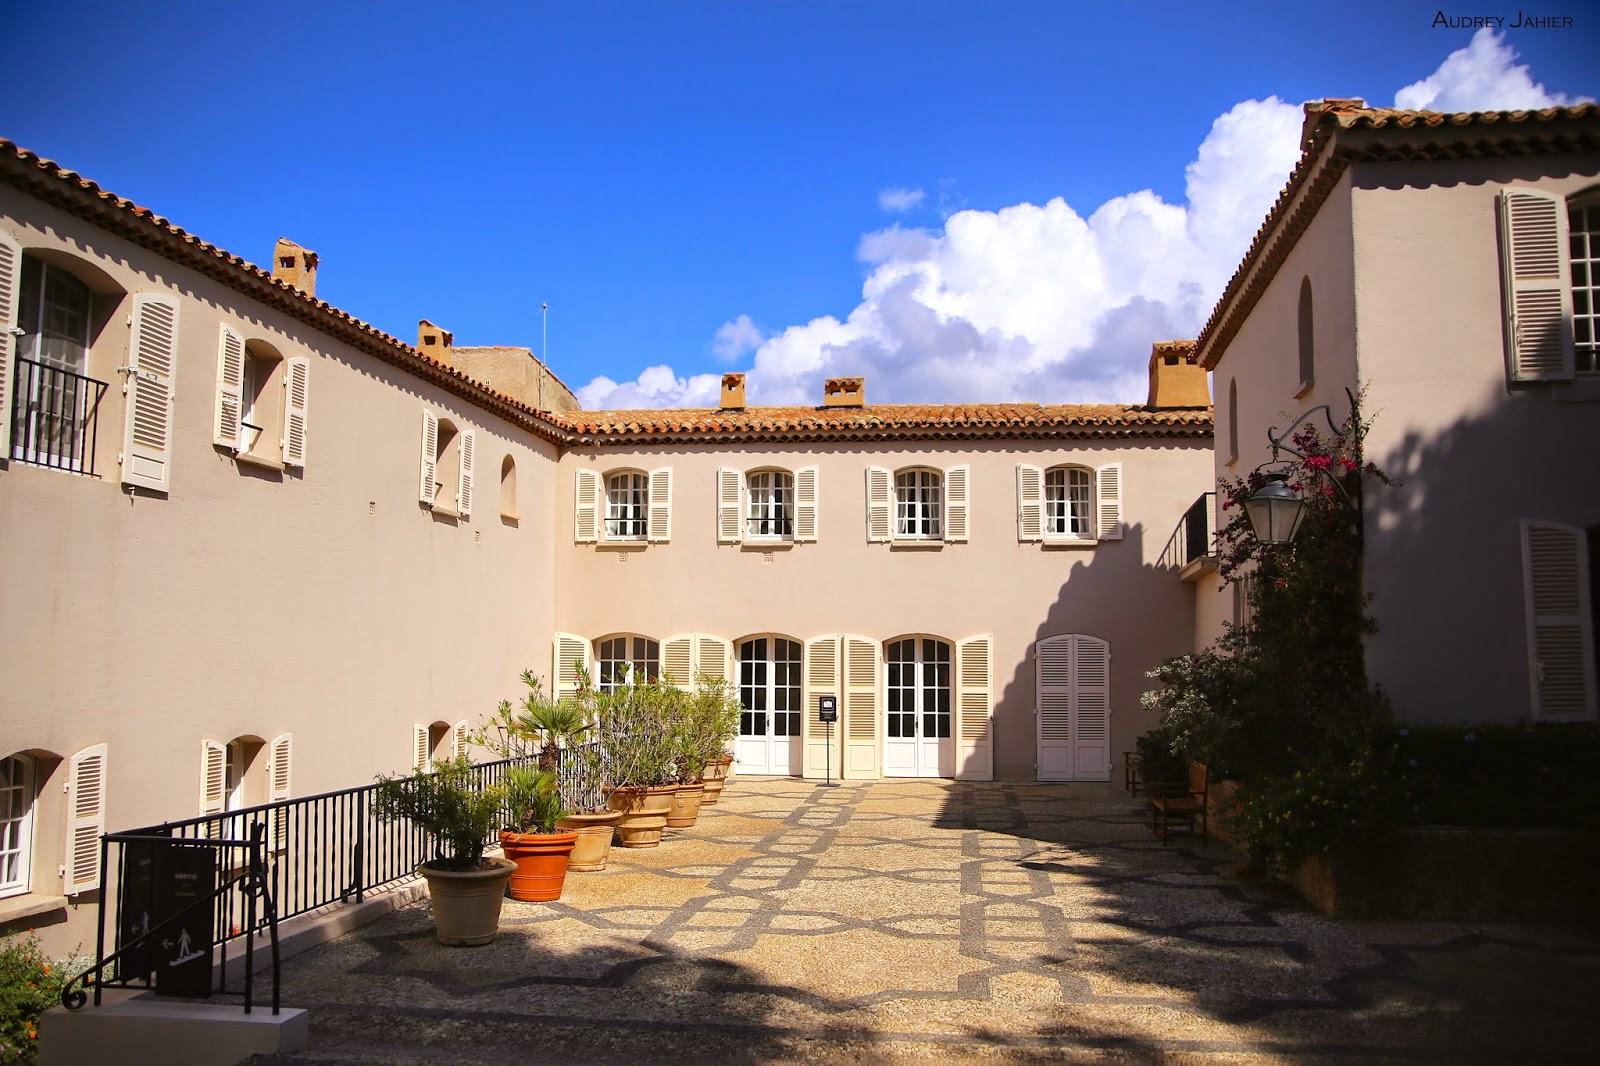 fort-de-bregançon-bormes-les-mimosas-france